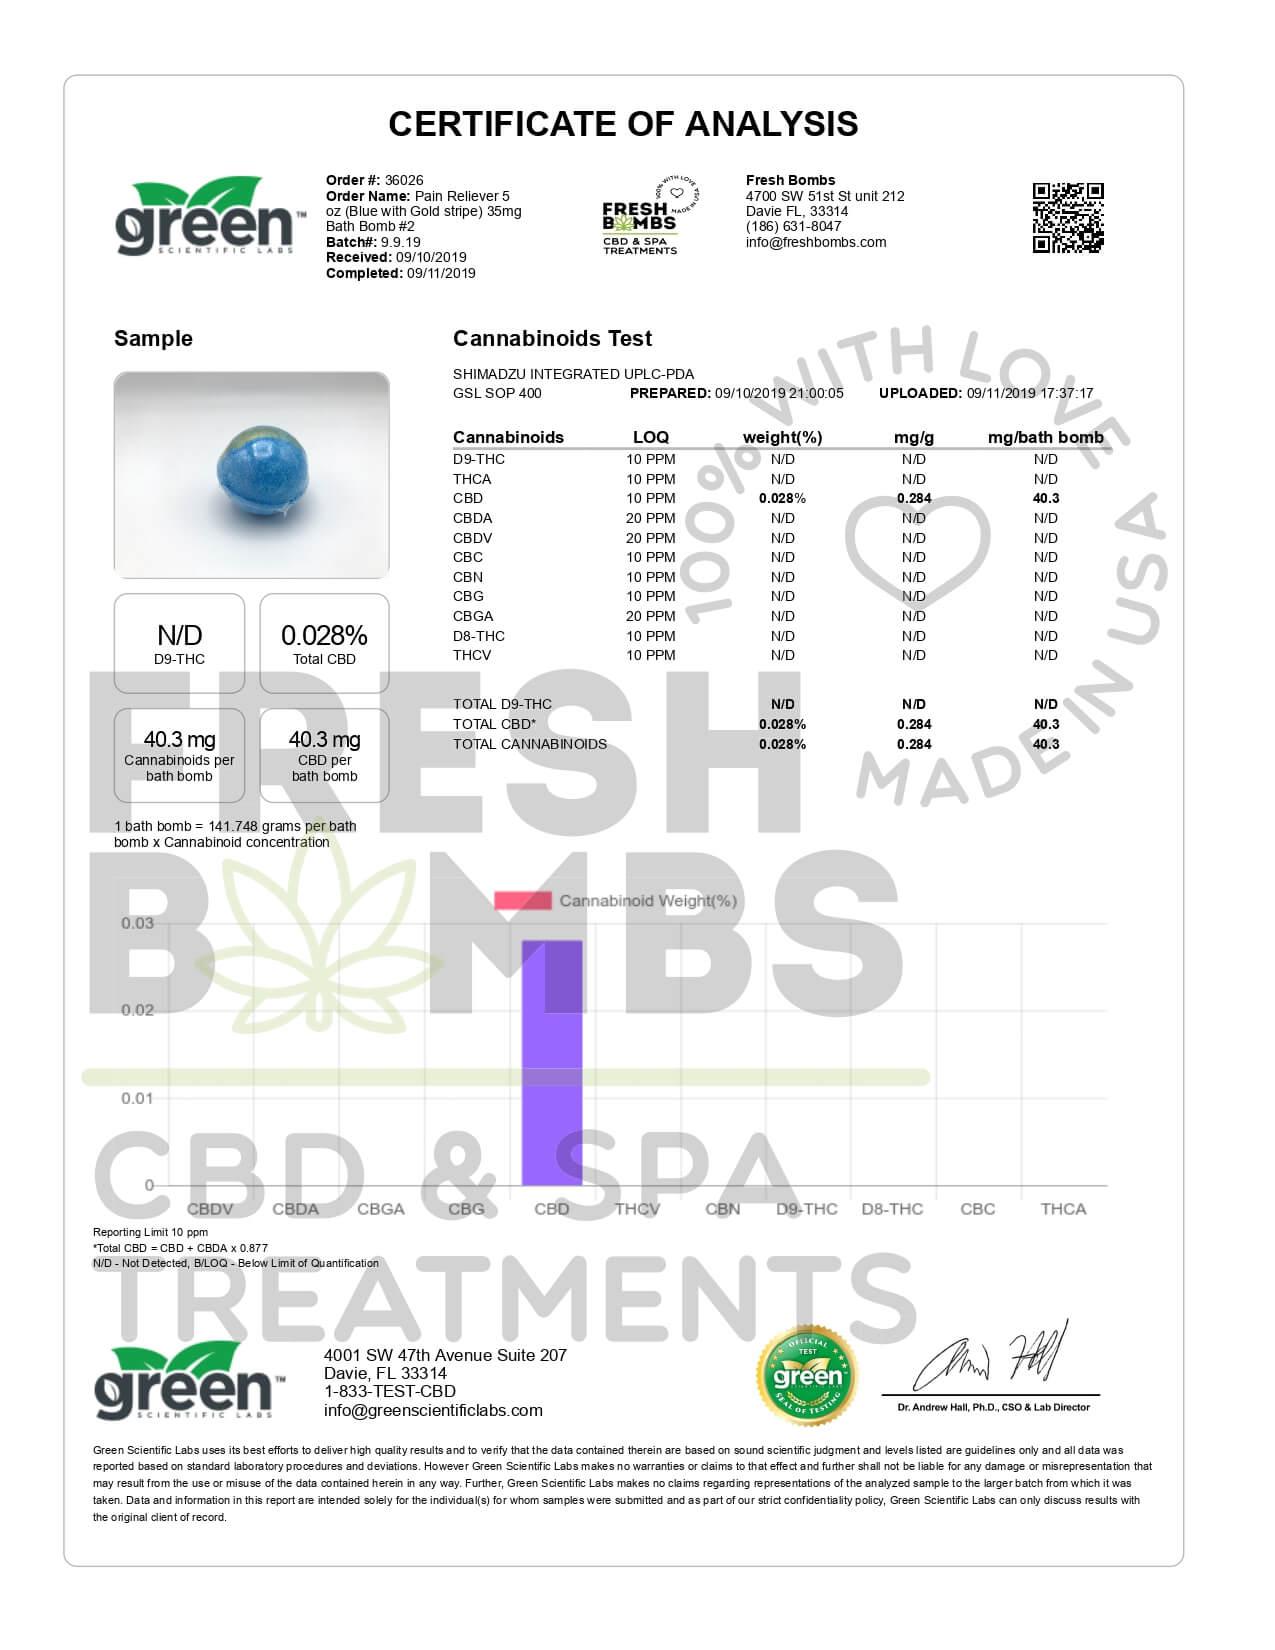 Fresh Bombs CBD Bath Pain Reliever Bath Bomb 5oz 35mg Lab Report